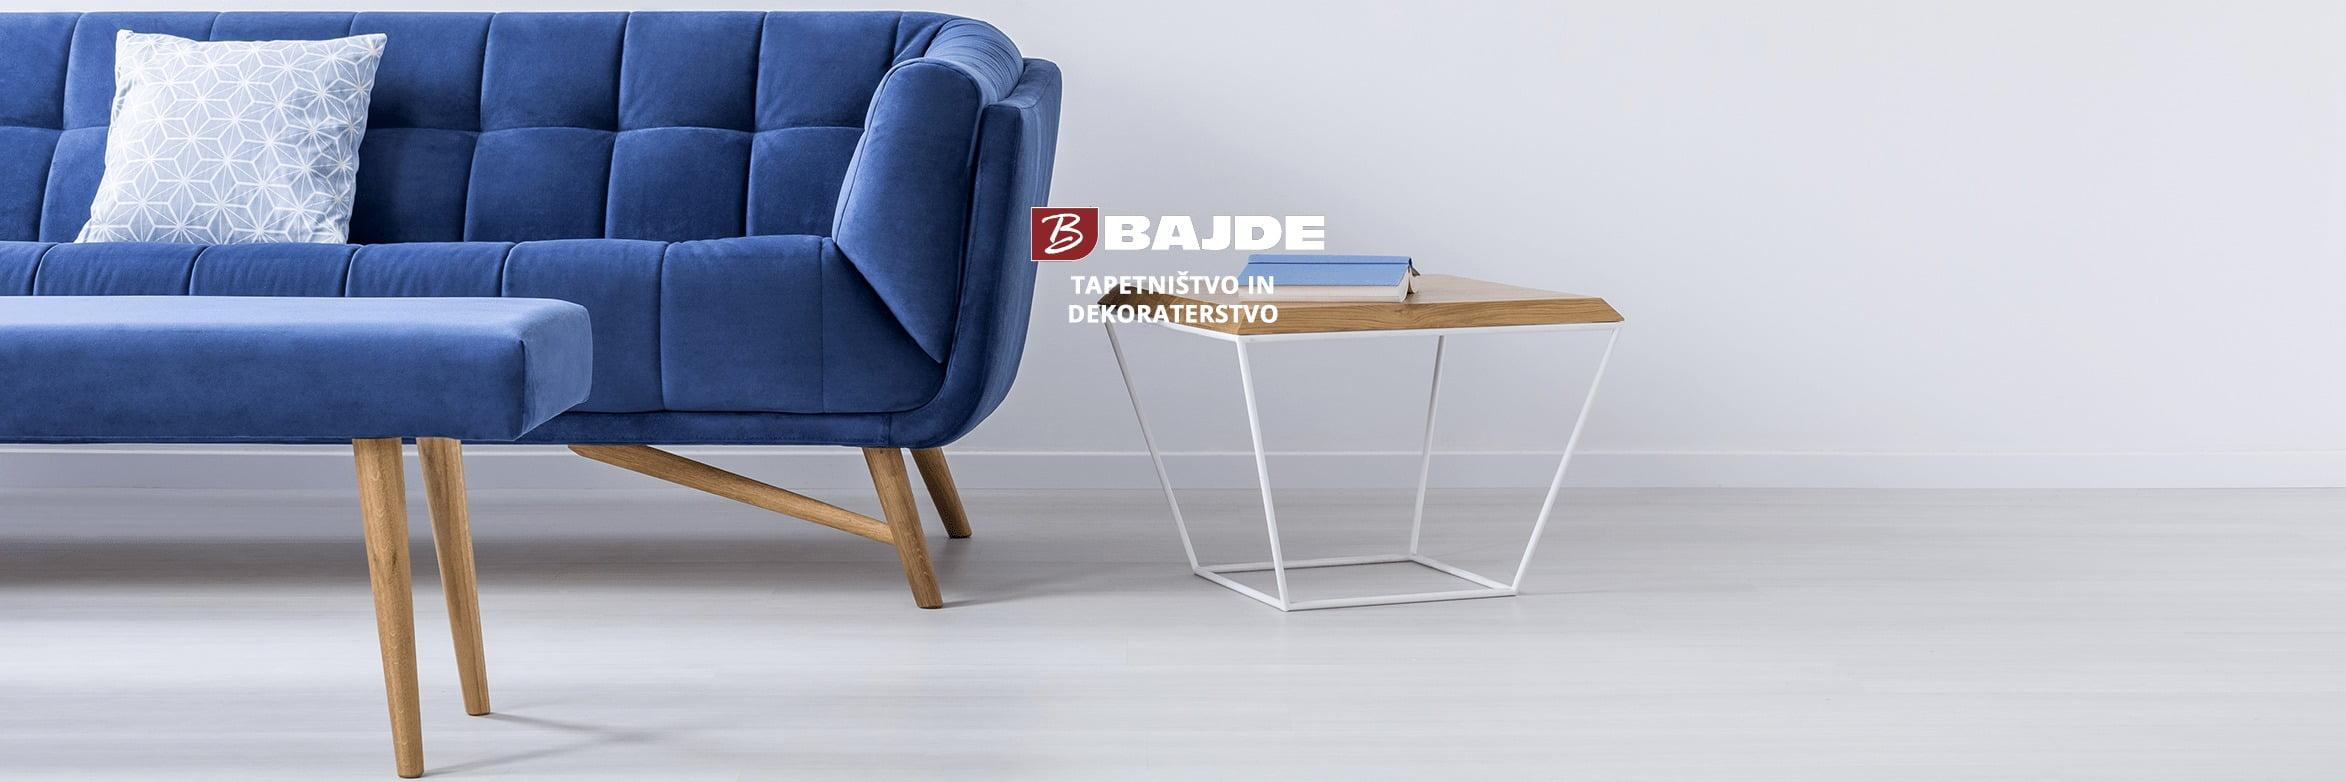 Tapetništvo & dekoraterstvo BAJDE 2bajde-a